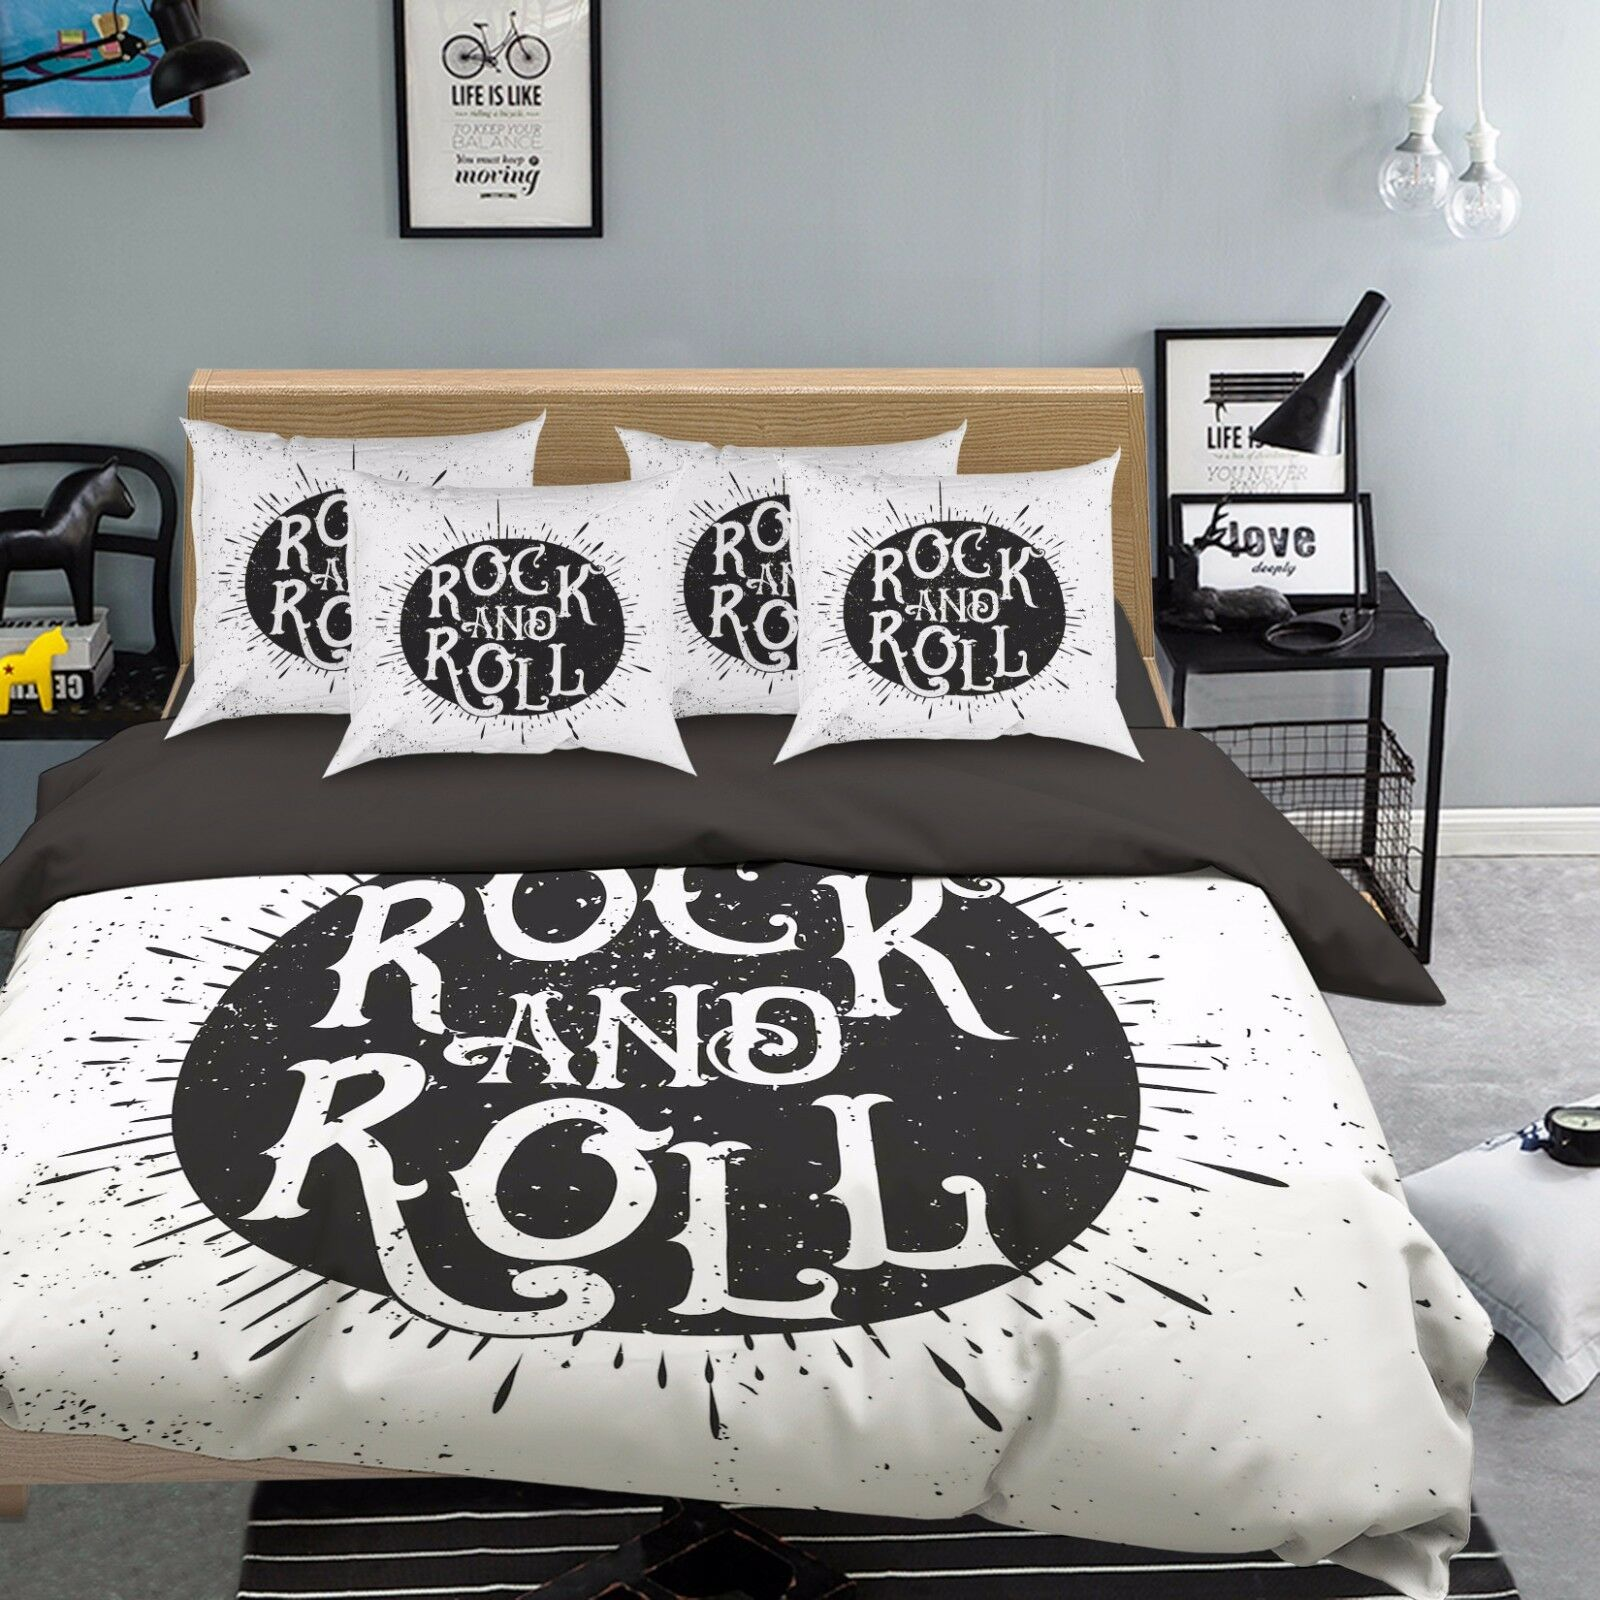 3D Letter Adorn 910 Bed Pillowcases Quilt Duvet Cover Set Single Queen UK Summer